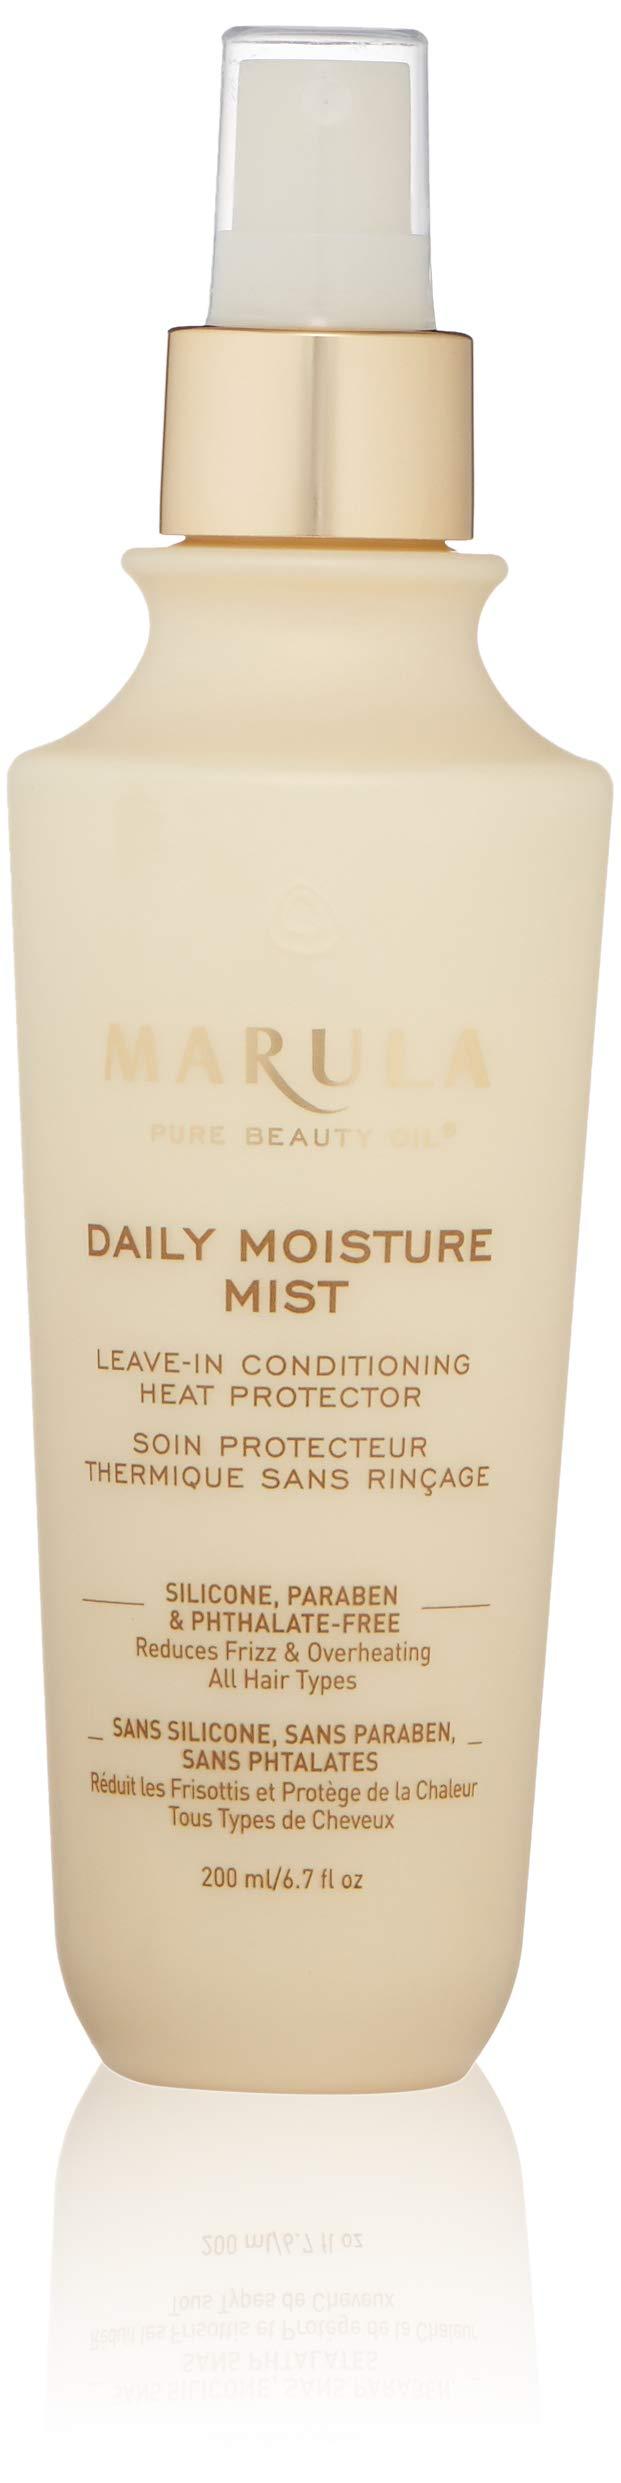 Marula Oil Daily Moisture Mist,6.7 Fl Oz by Marula Pure Beauty Oil